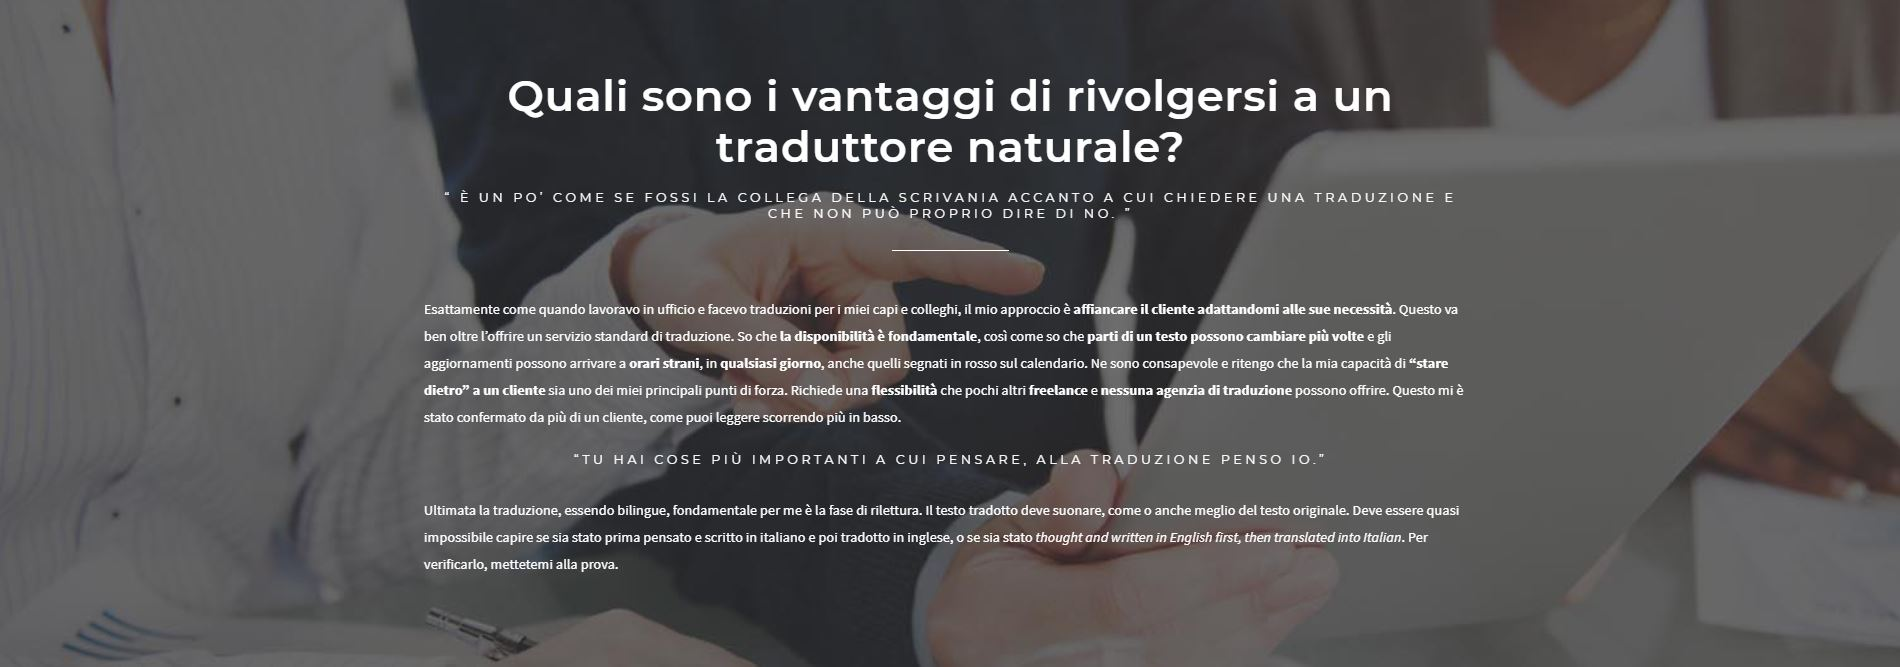 traduzioni italiano inglese